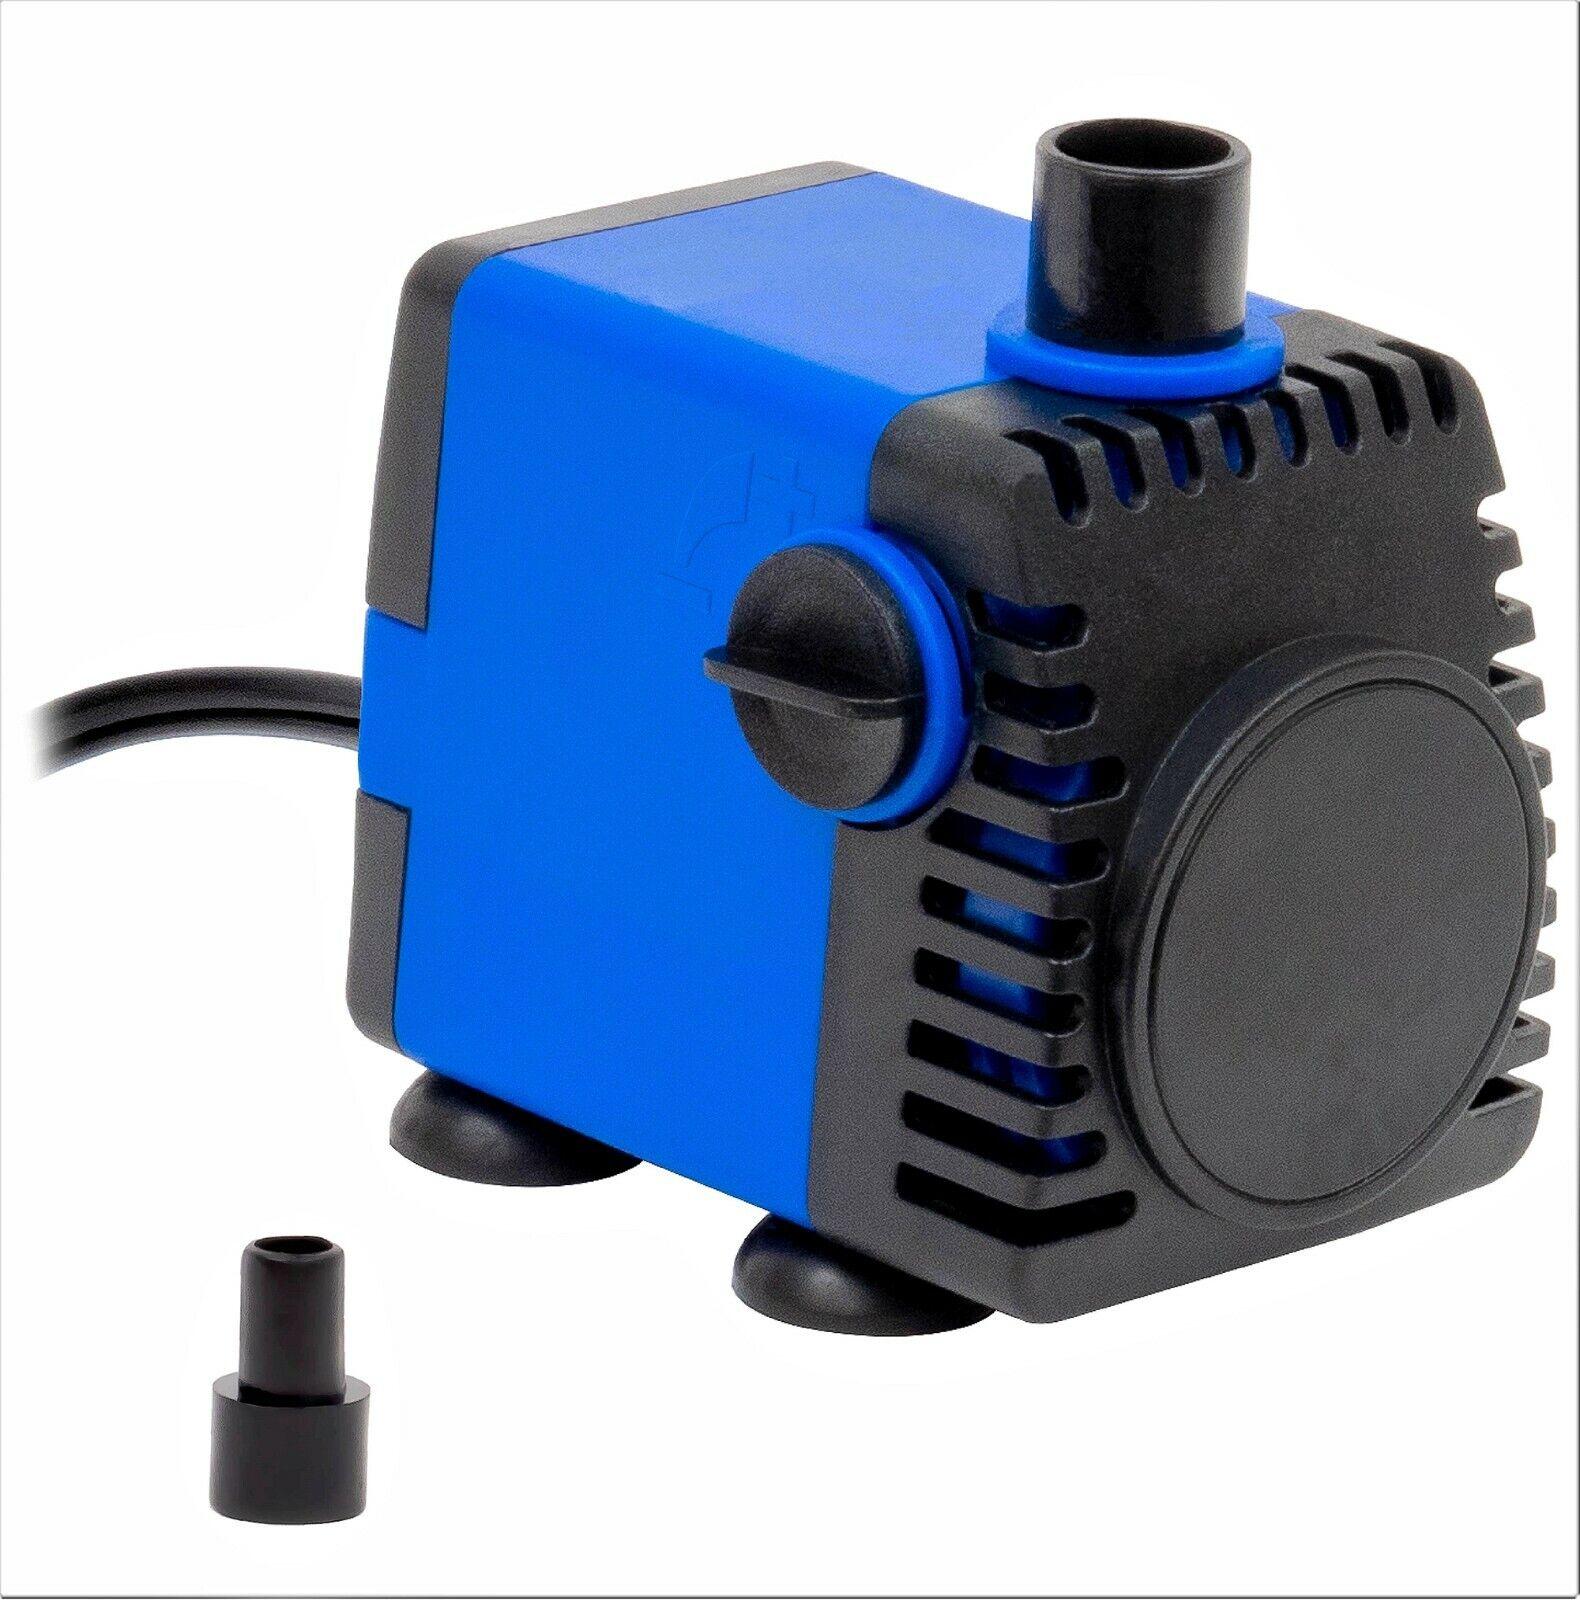 210 GPH Adjustable Submersible Water Pump